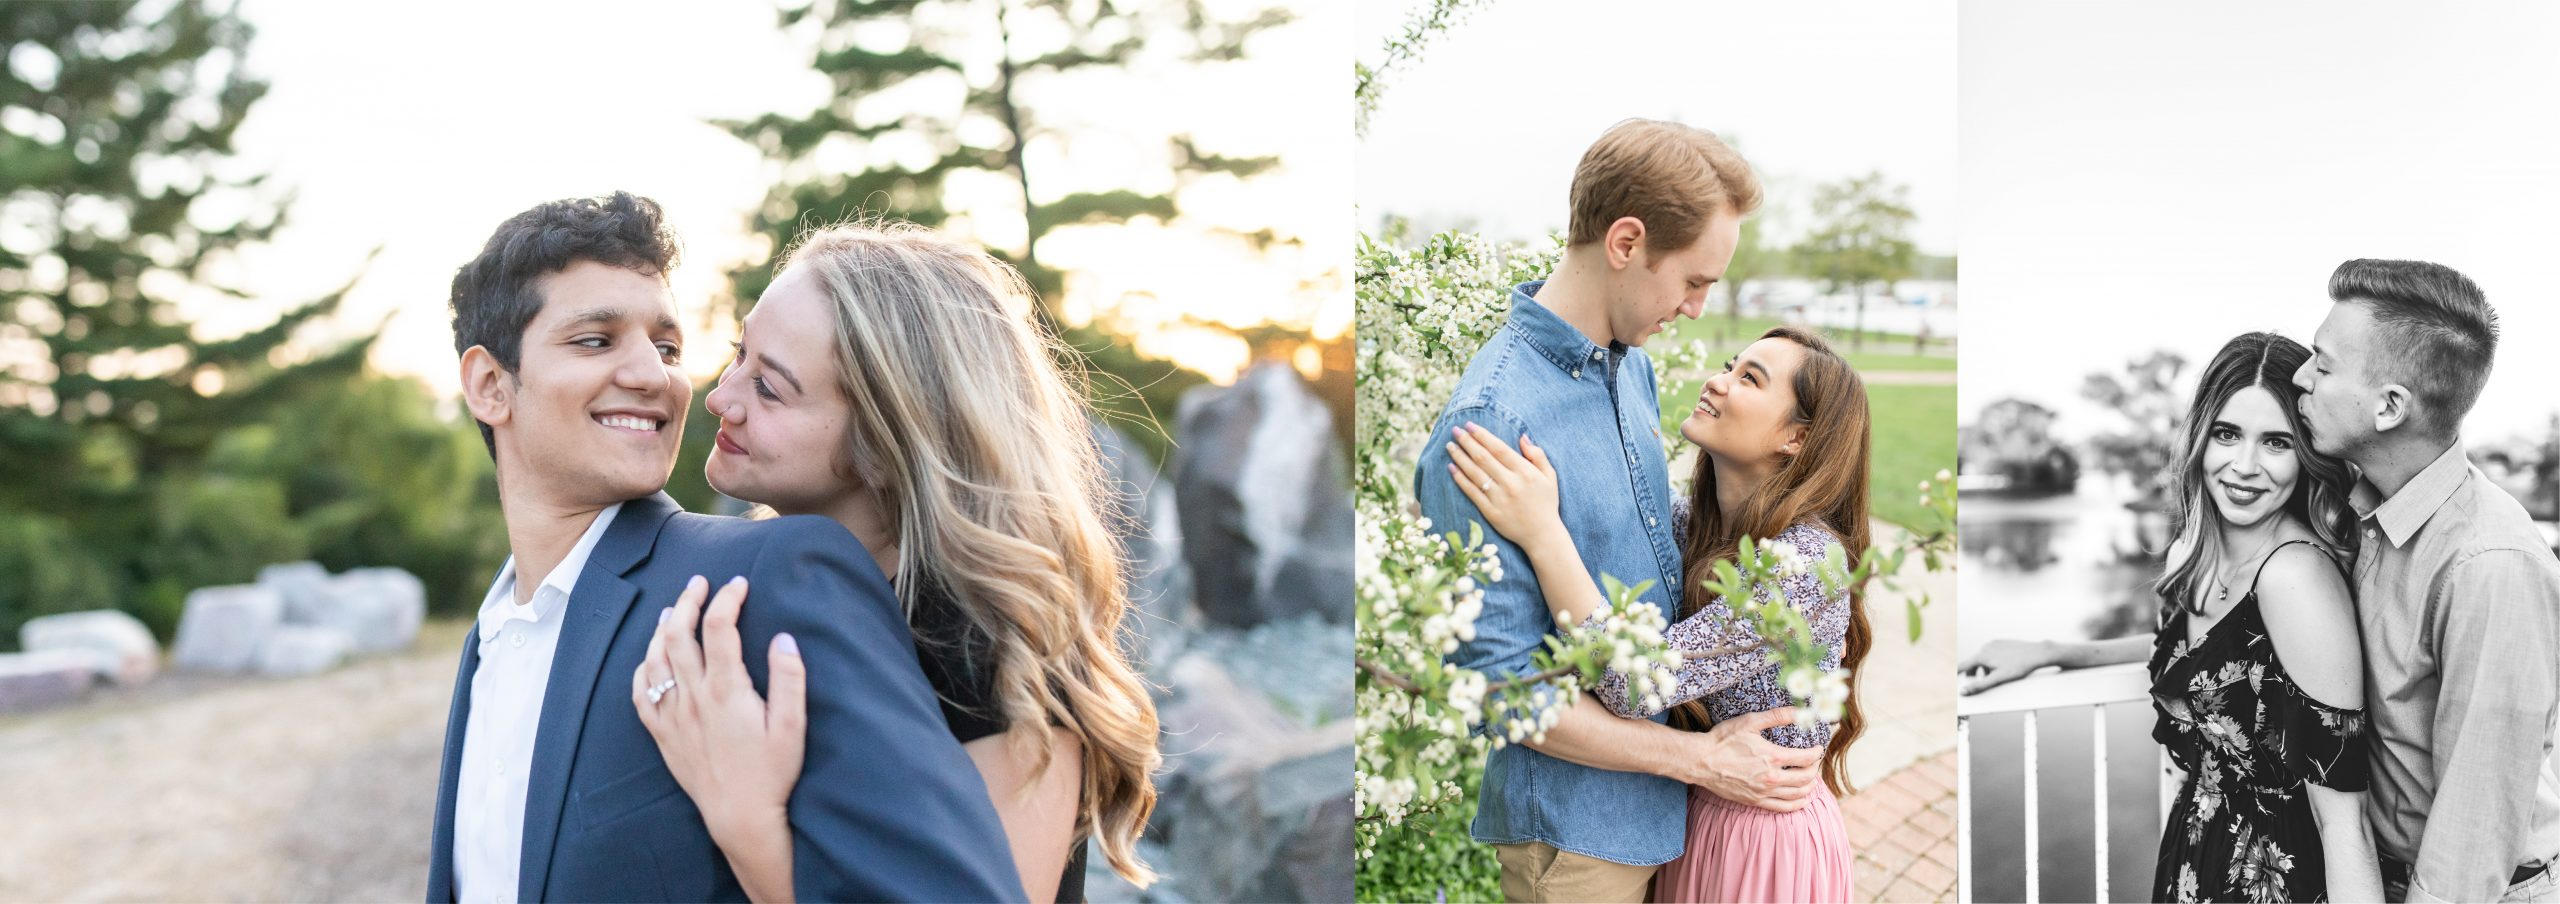 kandra-lynn-photography-wedding-photographer-07